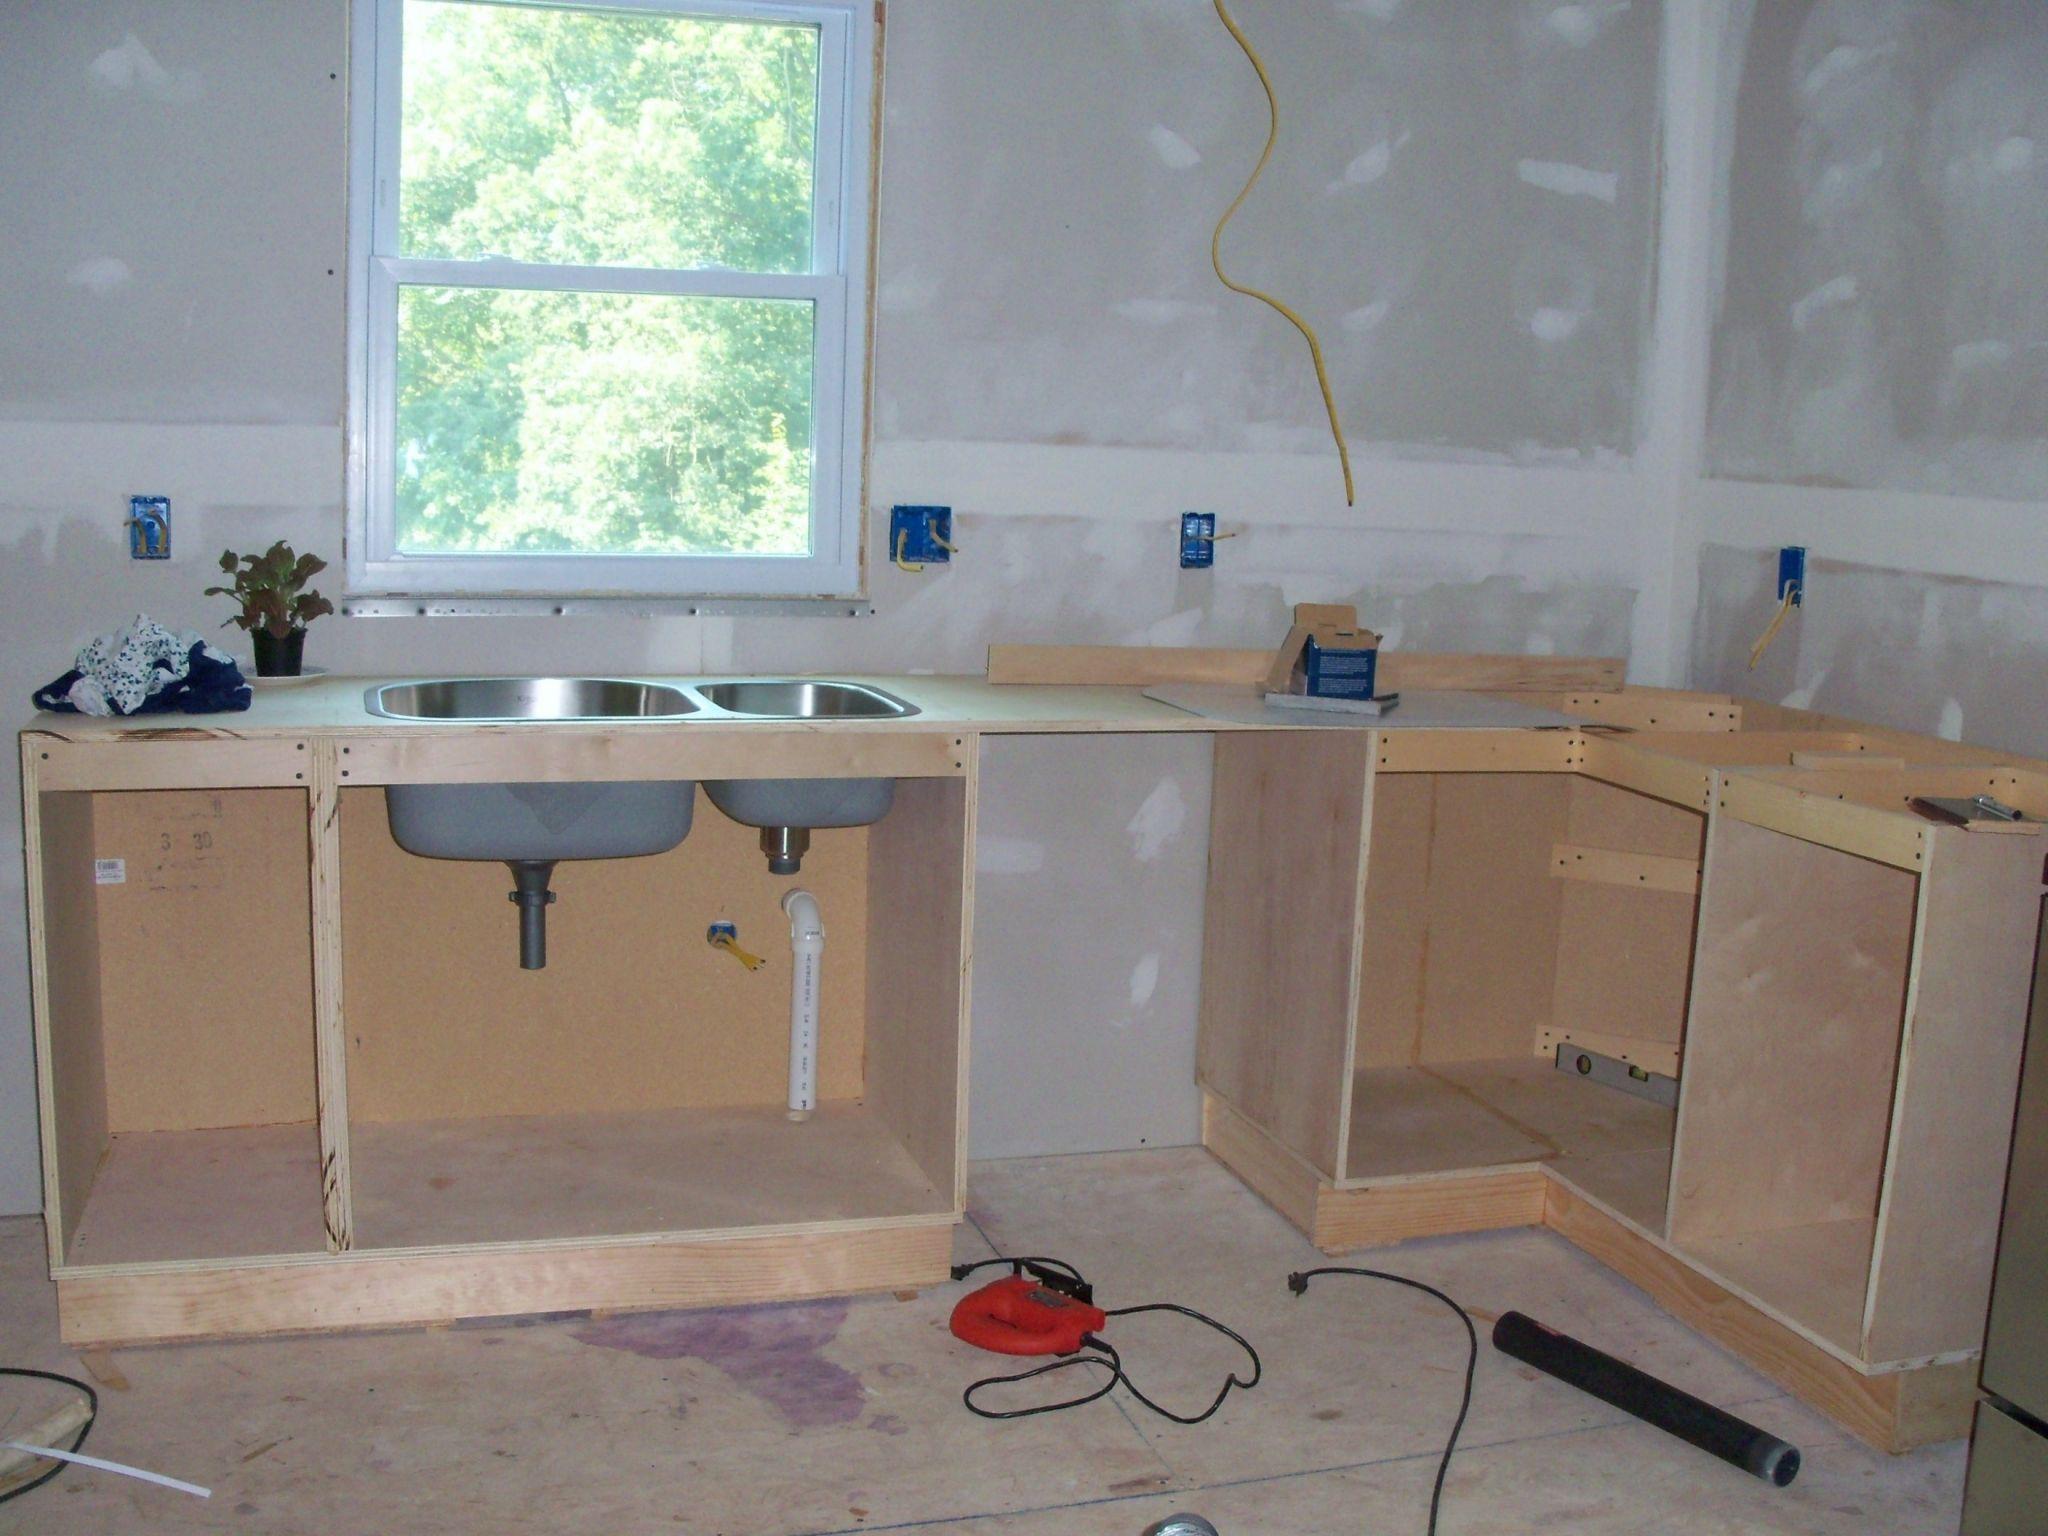 kitchen cabinet carcass kitchen cabinets update ideas on a